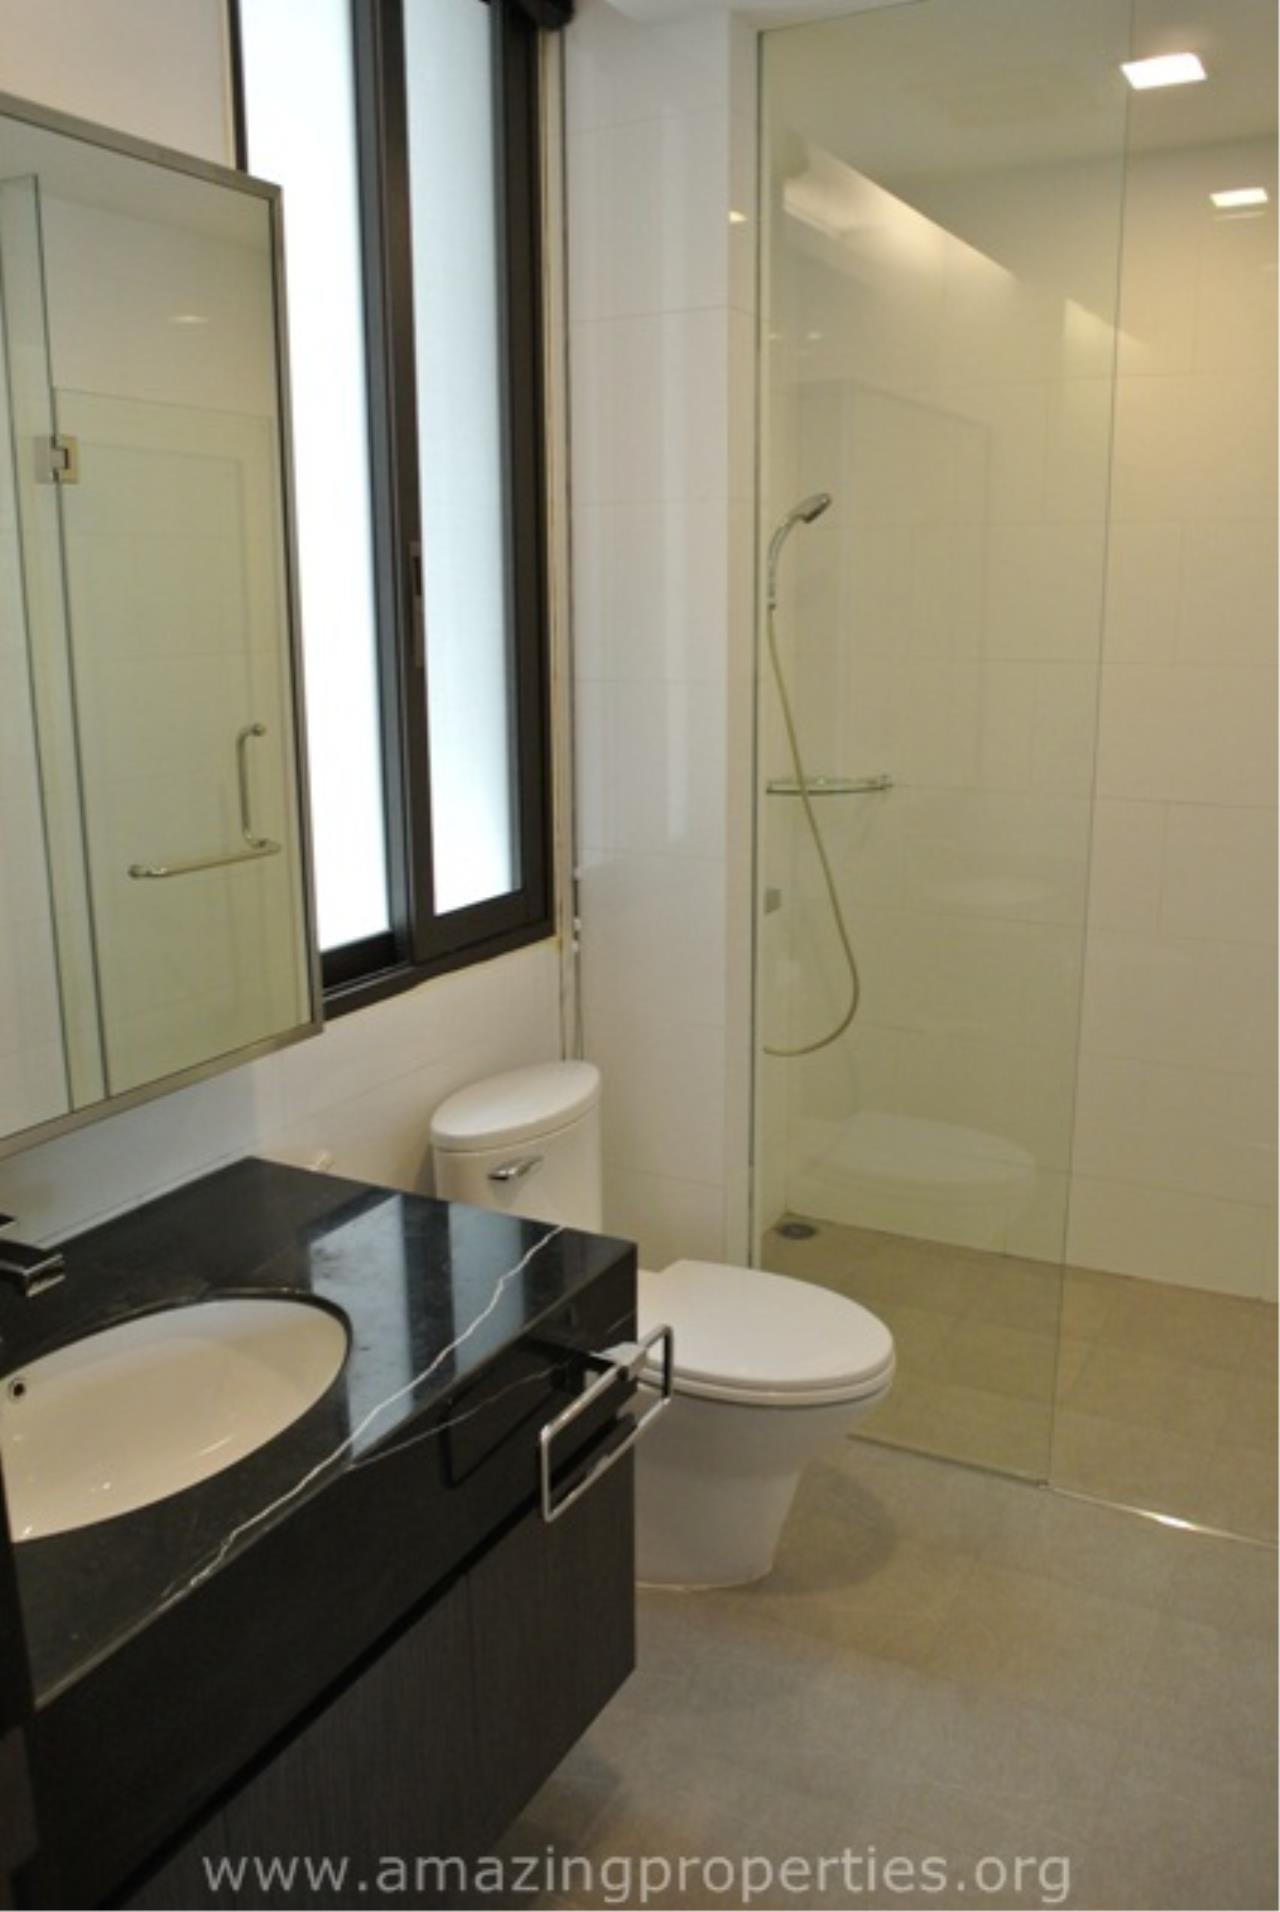 Amazing Properties Agency's 2 bedrooms Apartment for rent 12